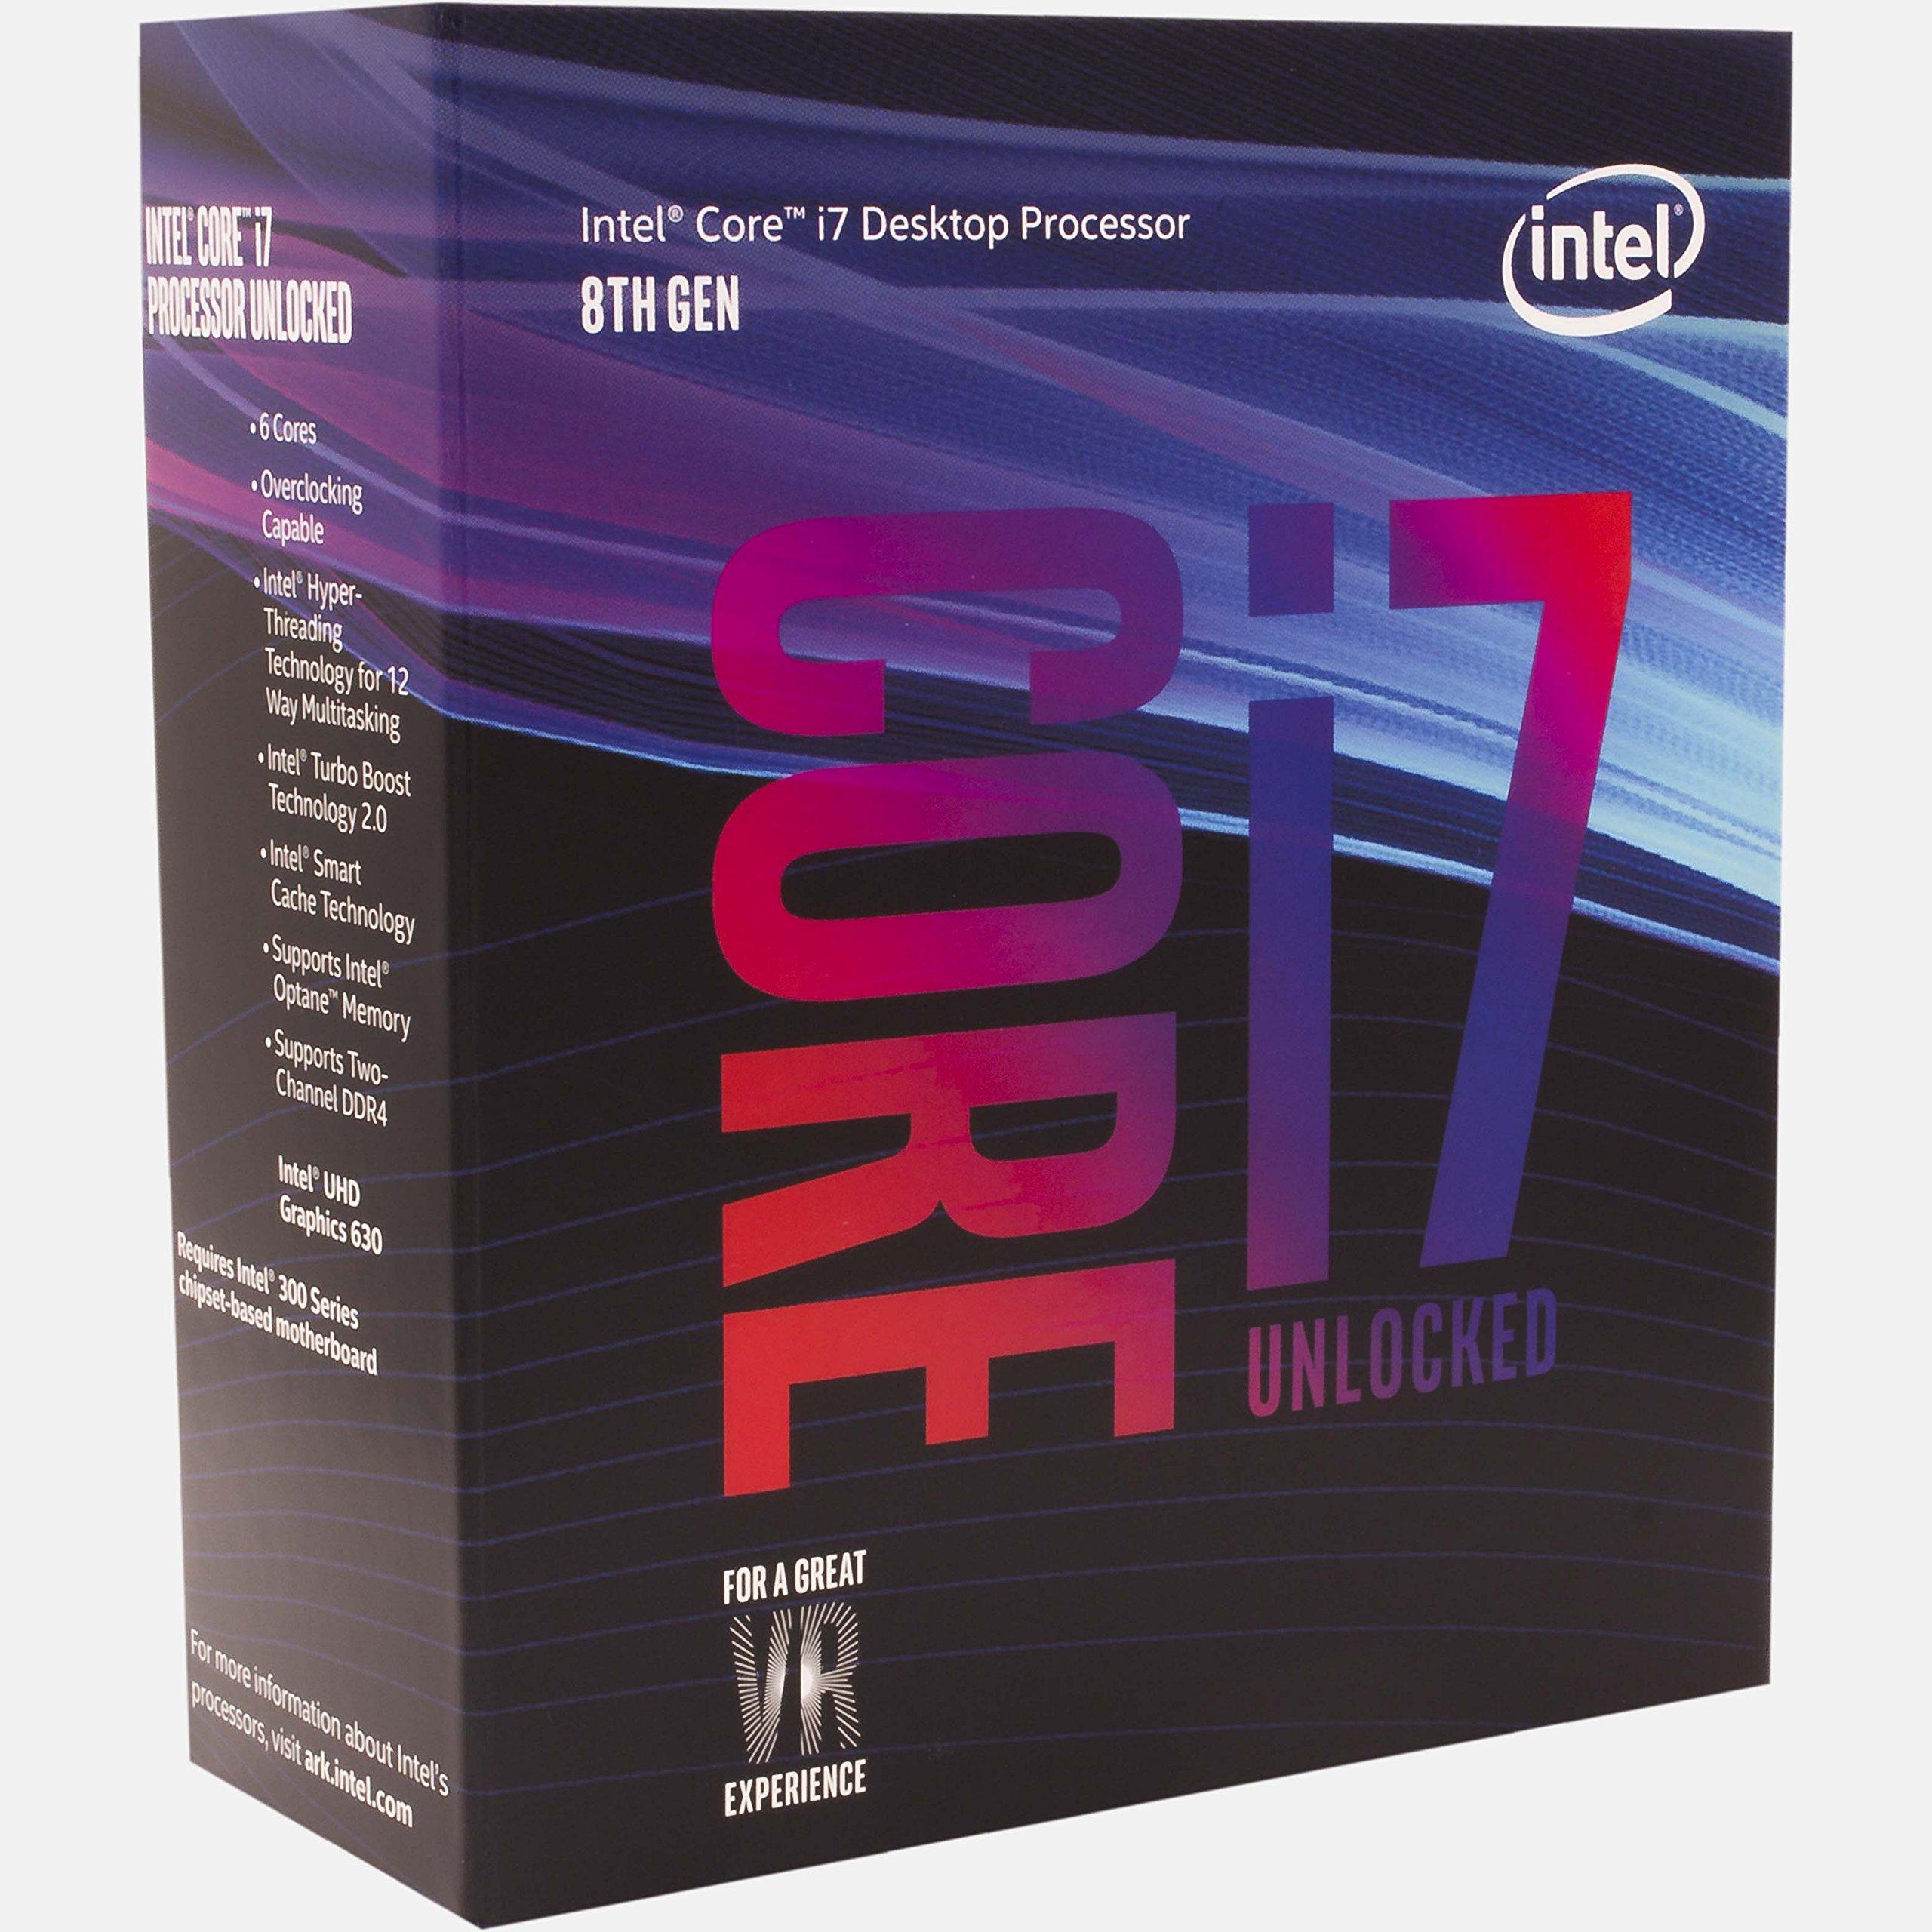 Intel Core i7-8700K 3.7GHz 12MB Smart Cache Box processor - processors (8th gen Intel� Core� i7, 3.7